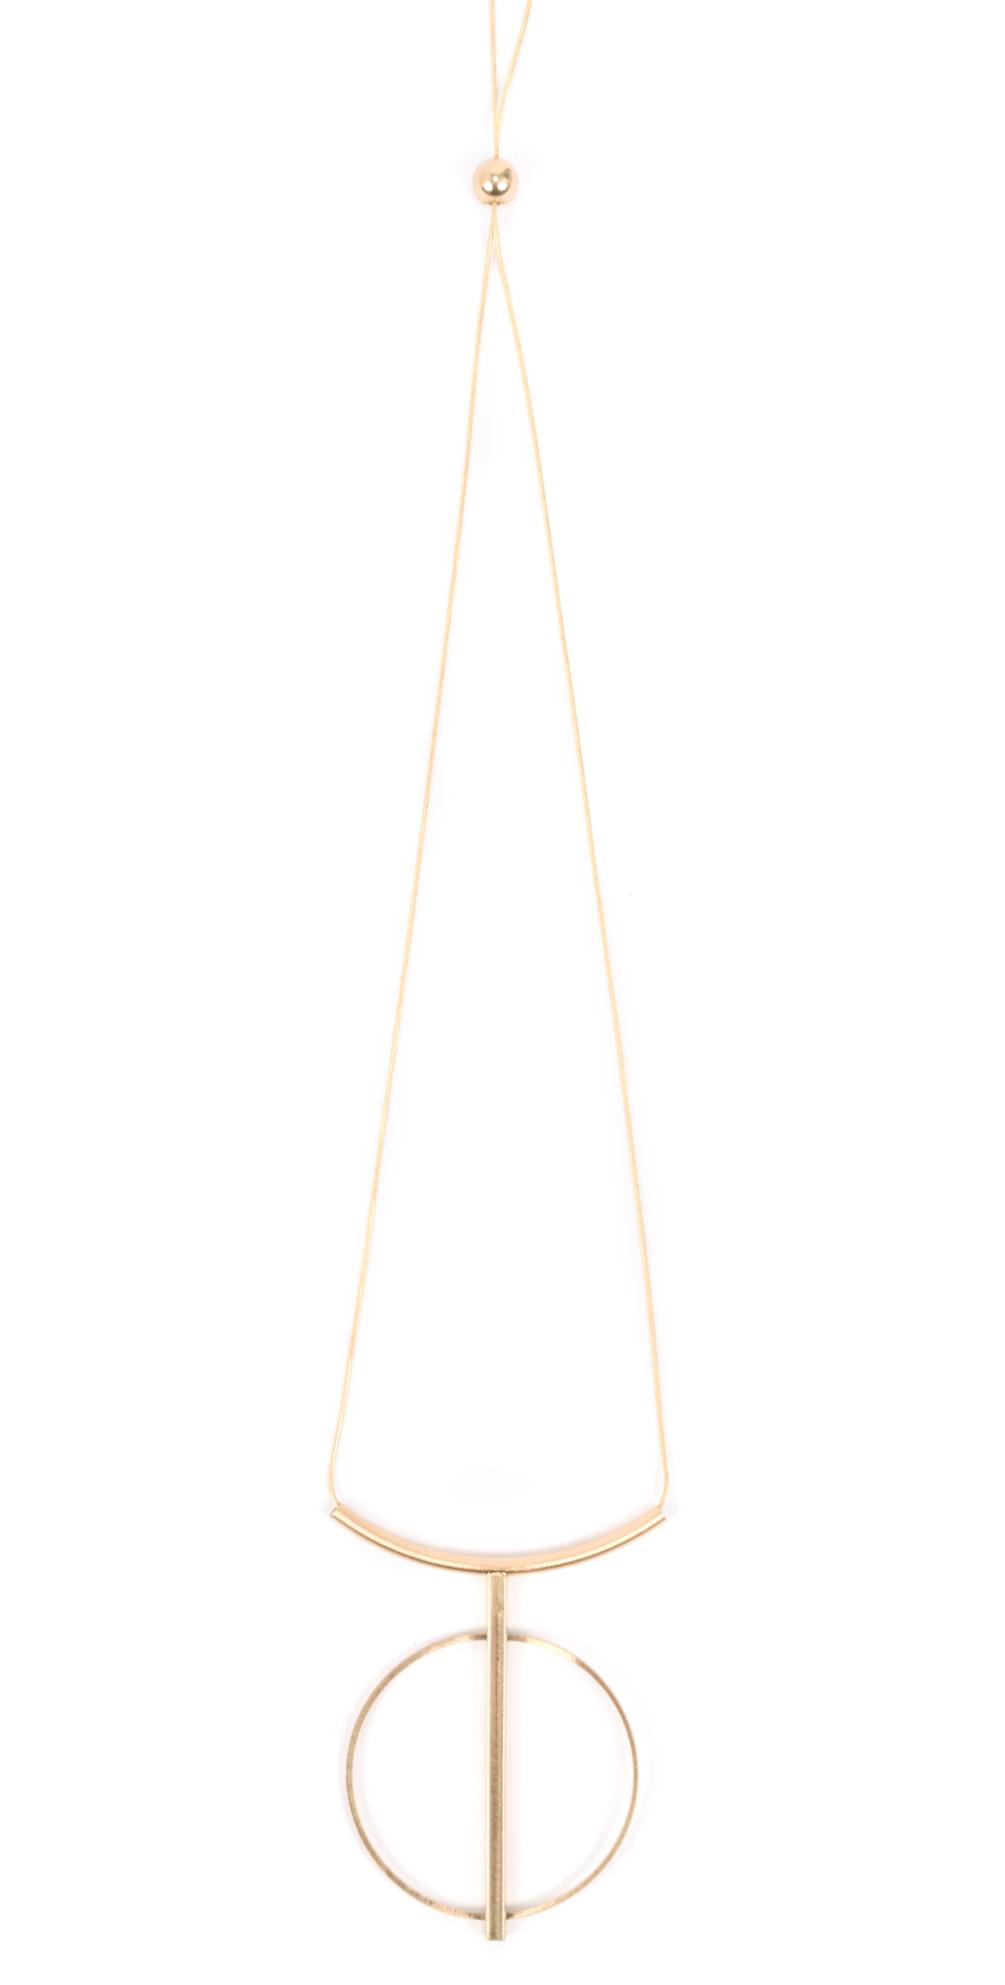 Tamara String Circle Necklace main image